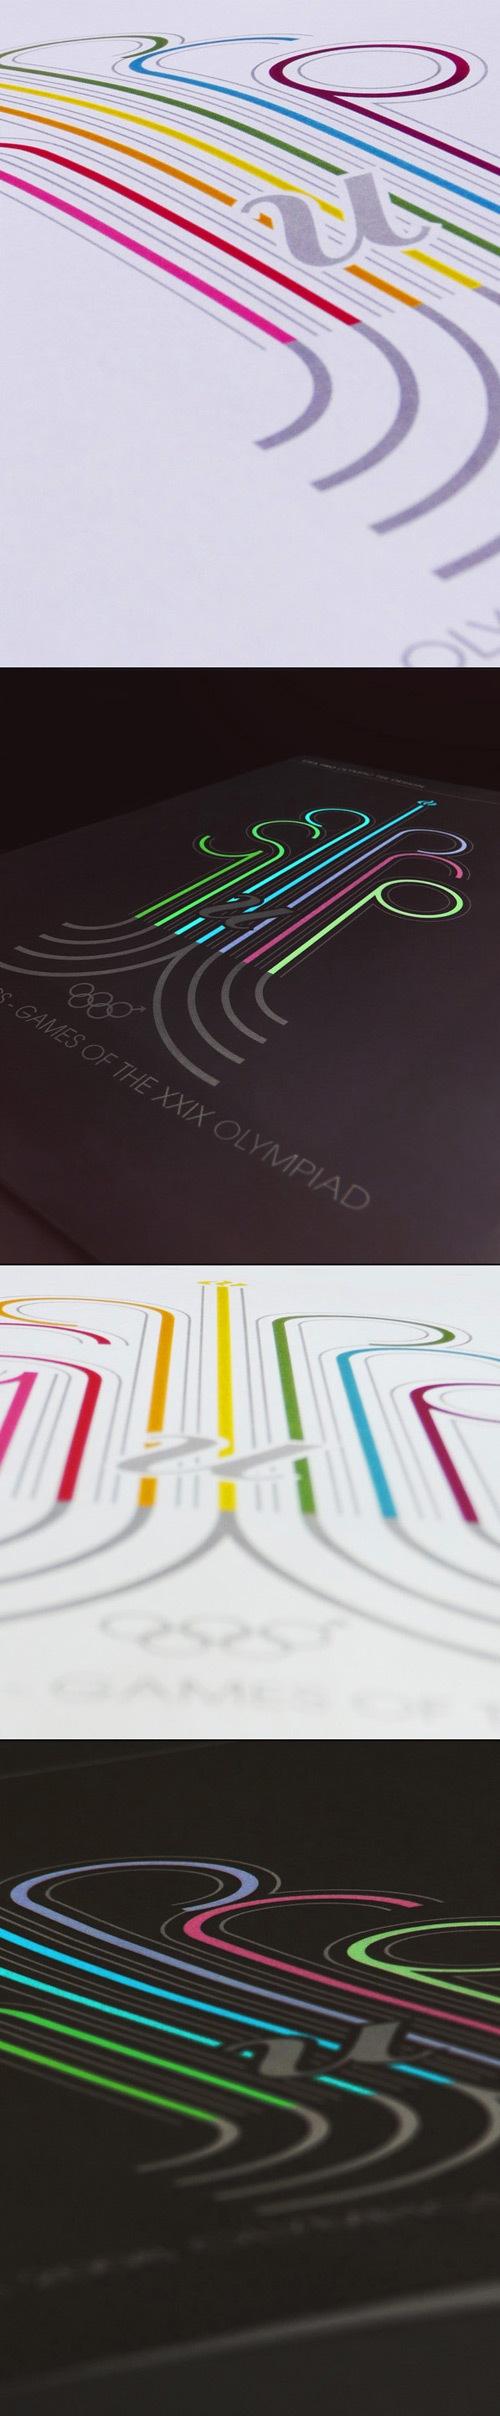 постеры к олимпиадам